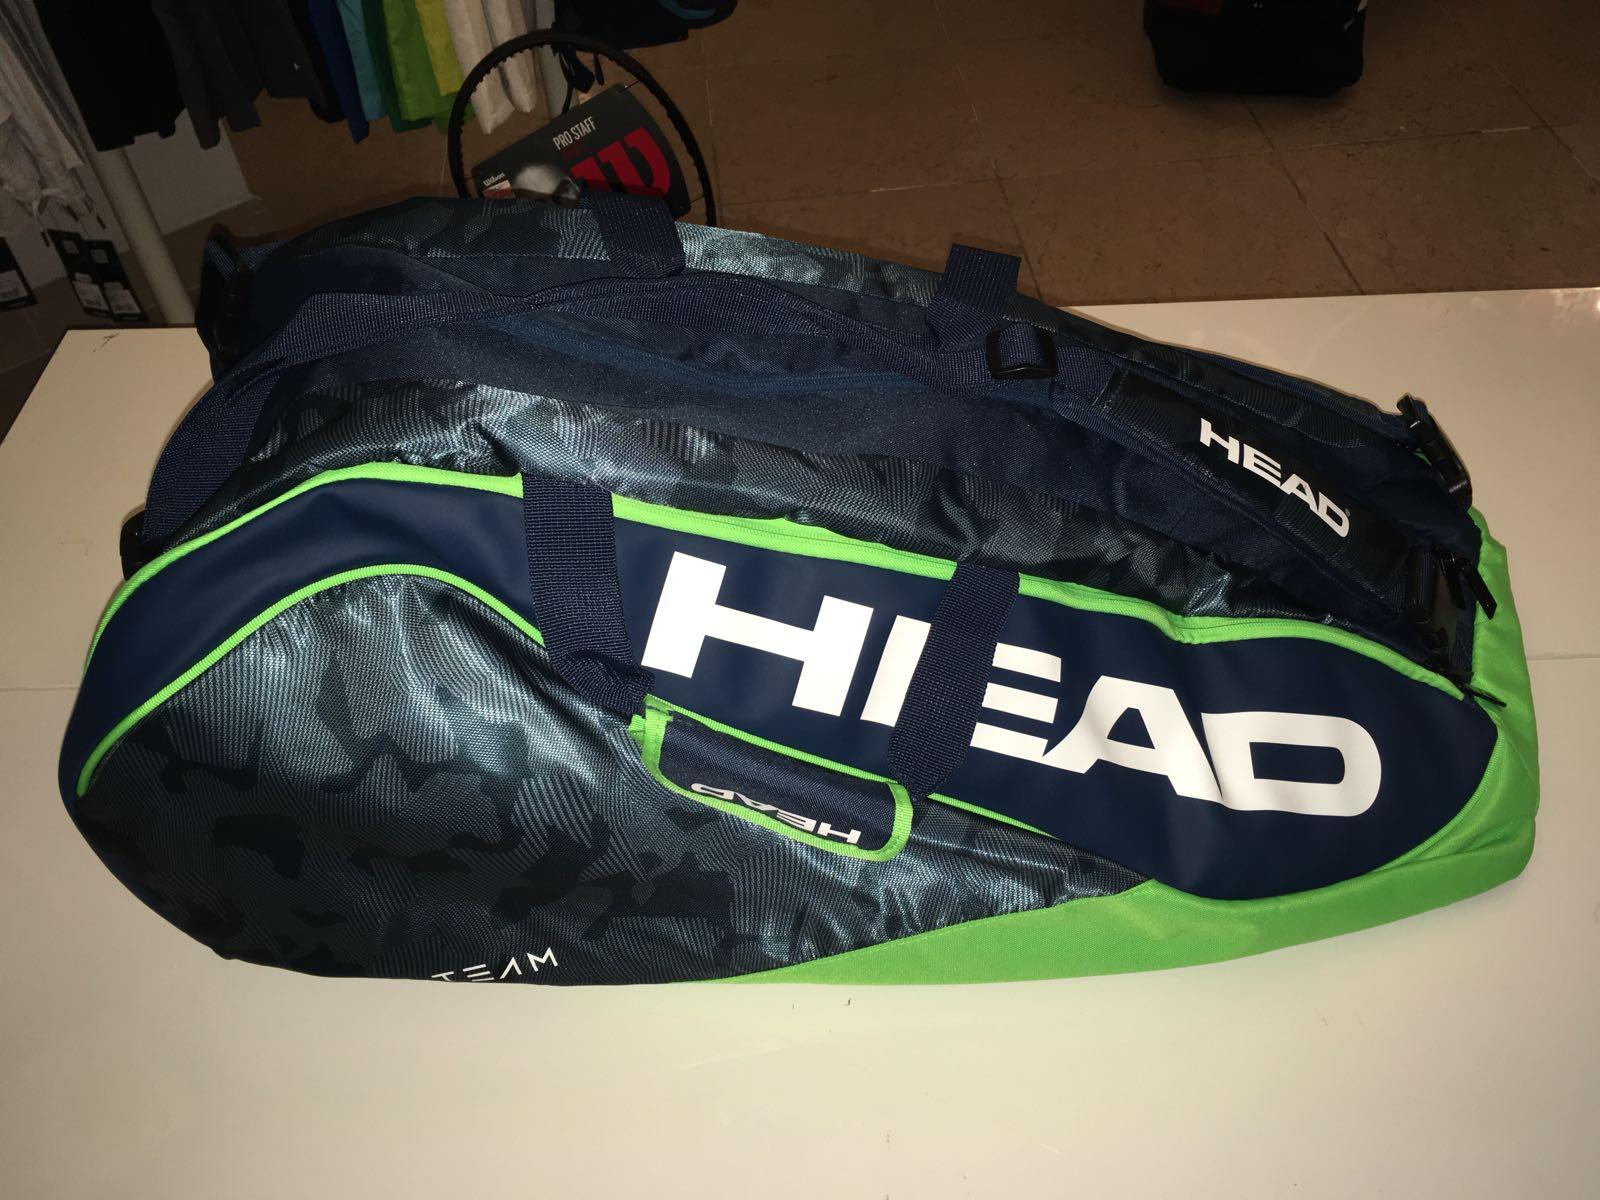 Head Borsa Tour Team 12R Combi Navy-Verde